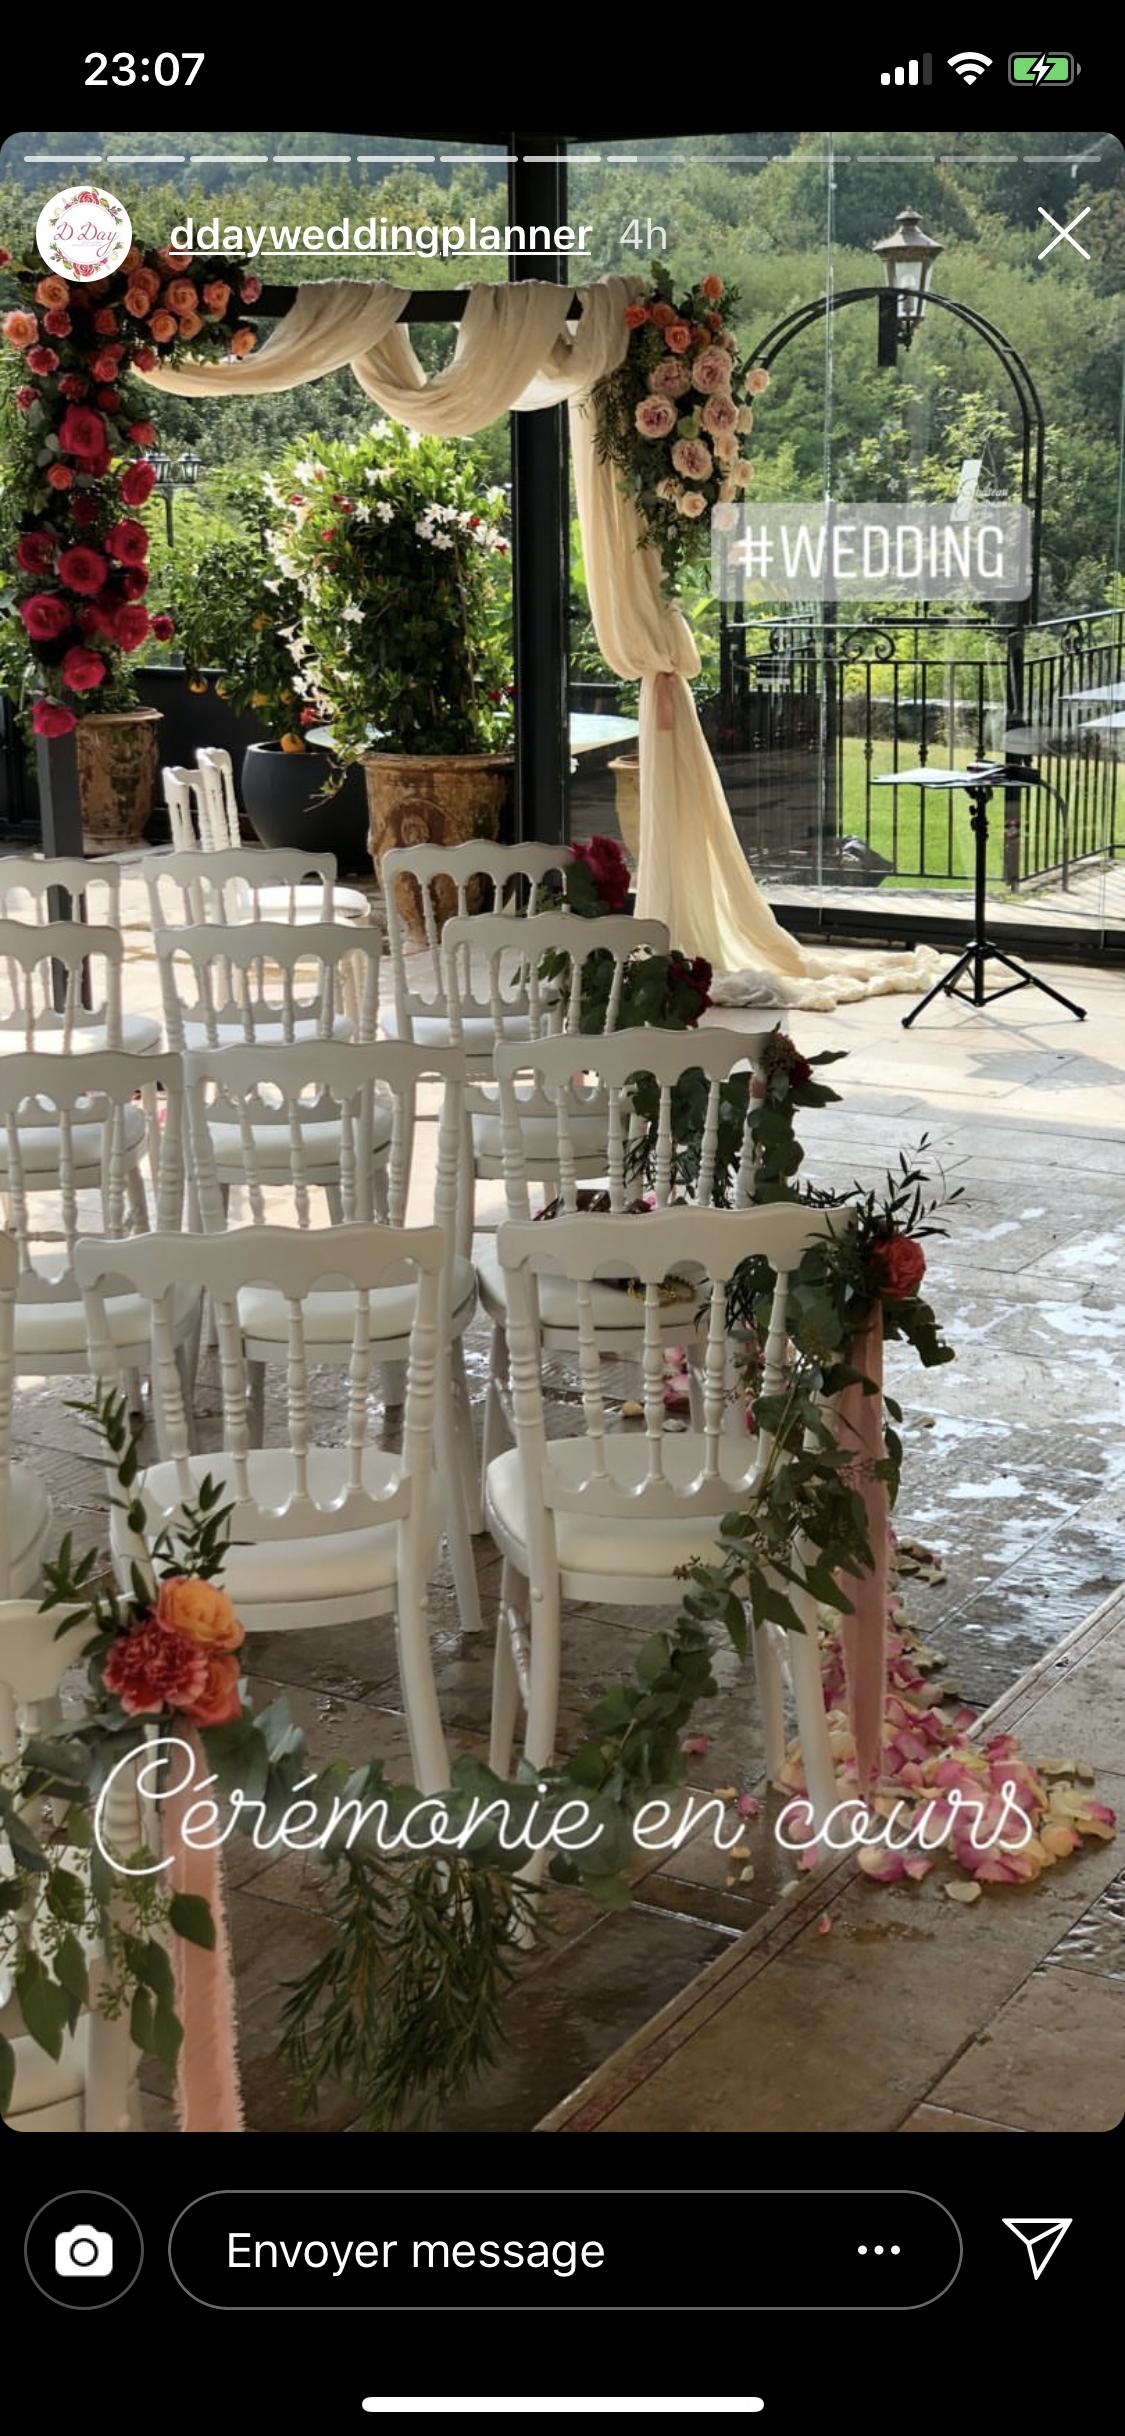 Vintage wedding decorations ideas november 2018 Pin by Steph Williams on wedding in   Pinterest  Wedding